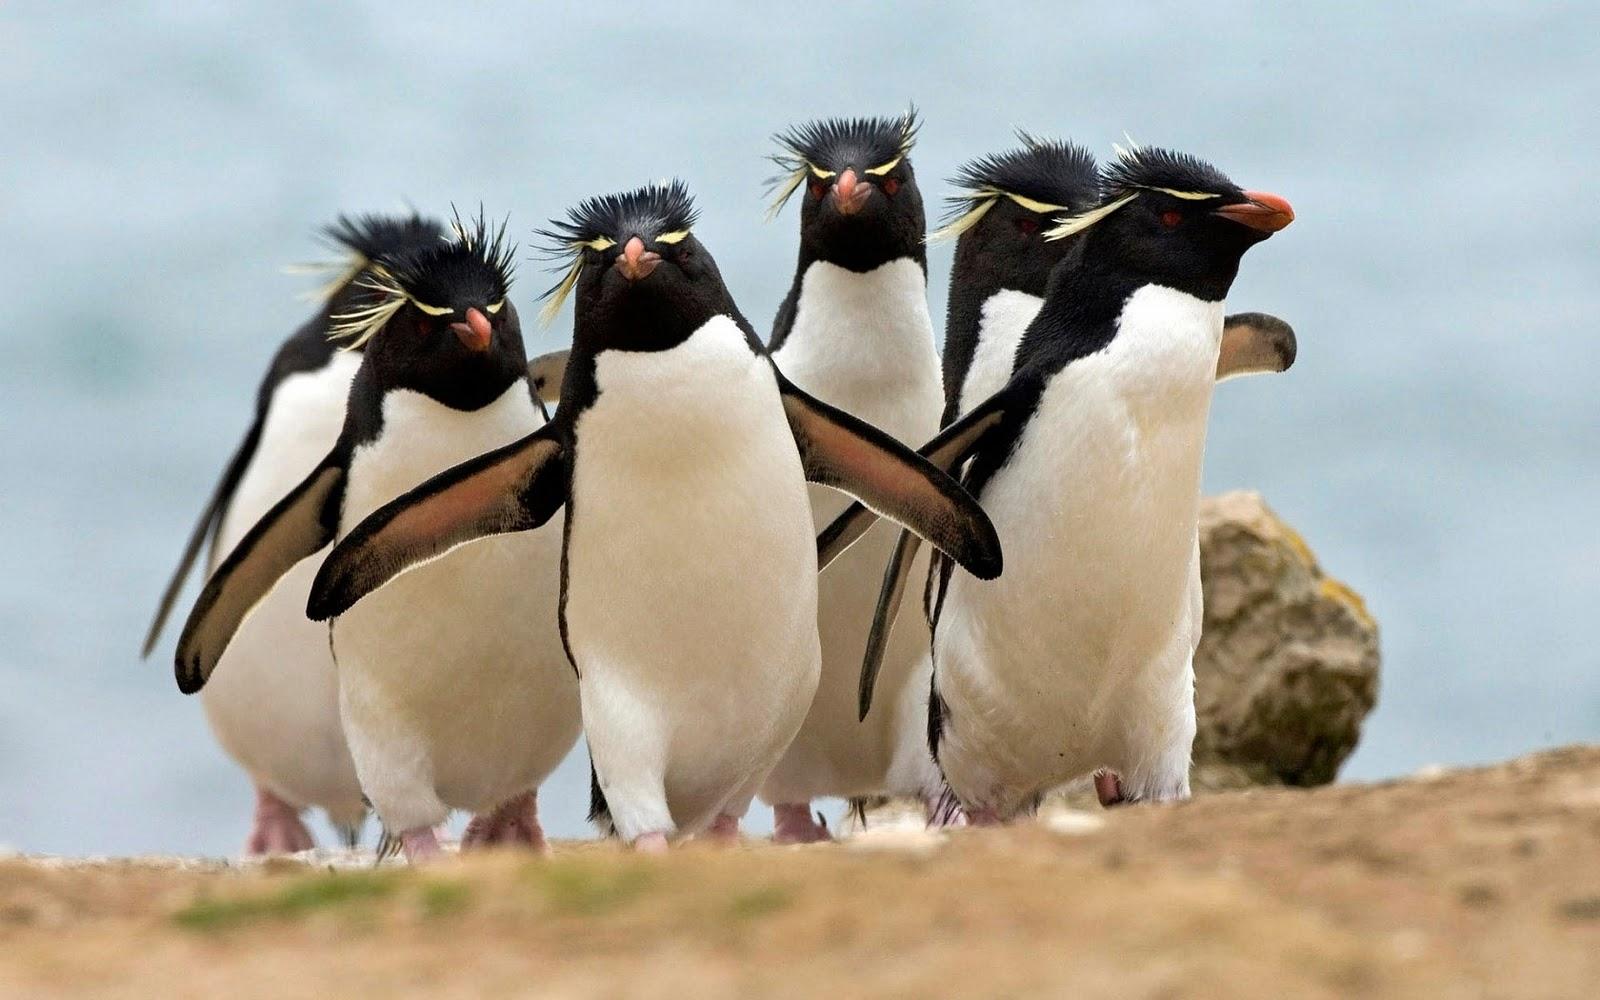 Cute Penguin Wallpaper Cartoon Pinguin Achtergronden Hd Wallpapers